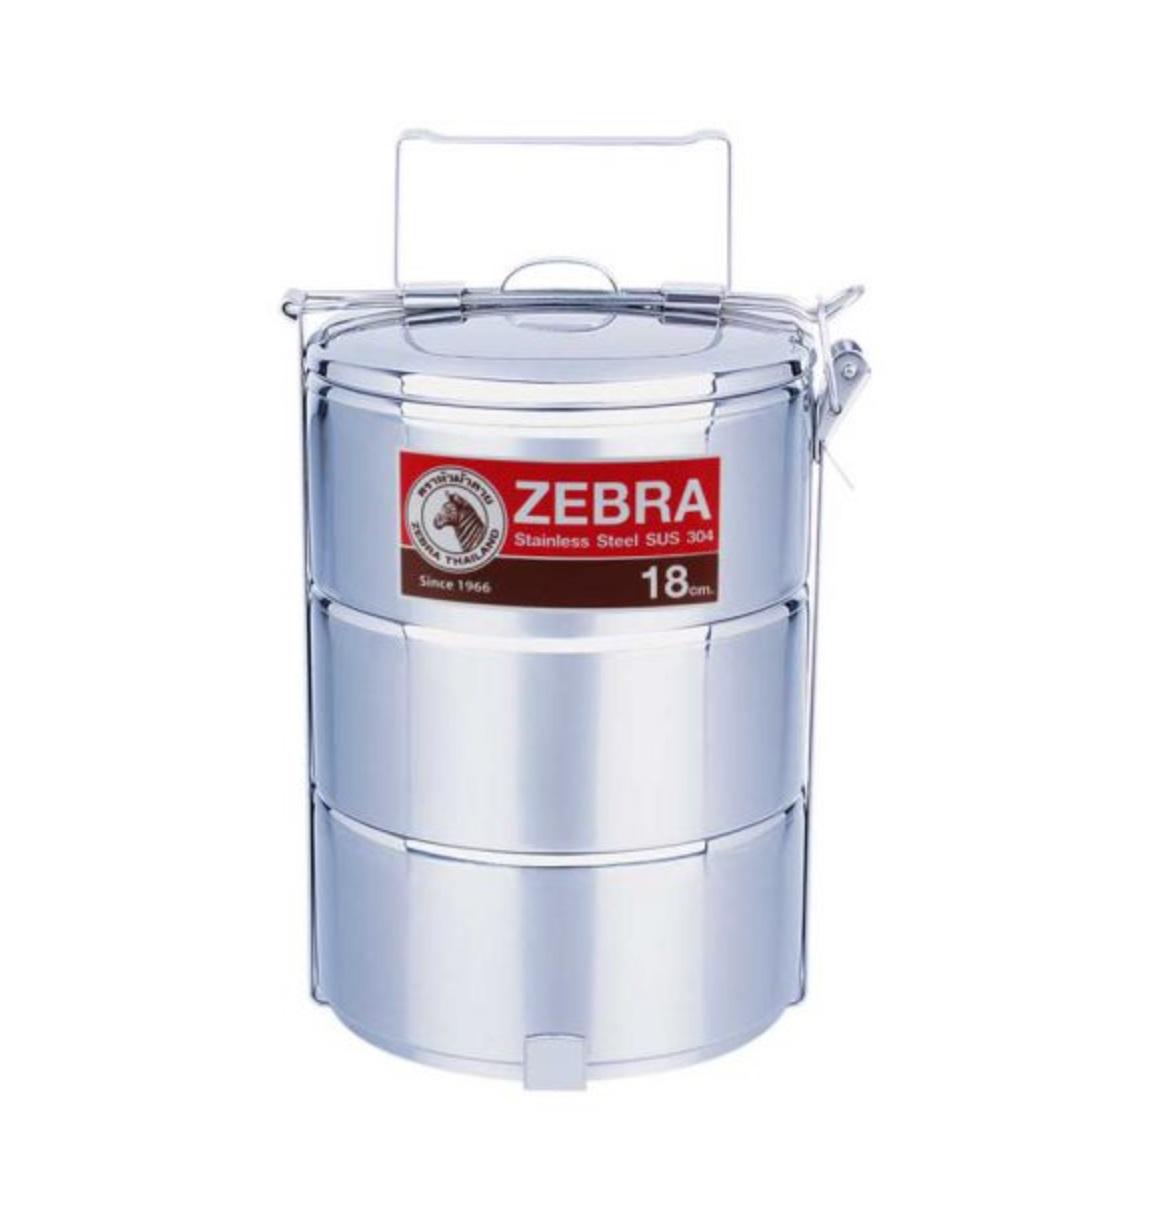 Zebra 18cm X 3 Food Carrier